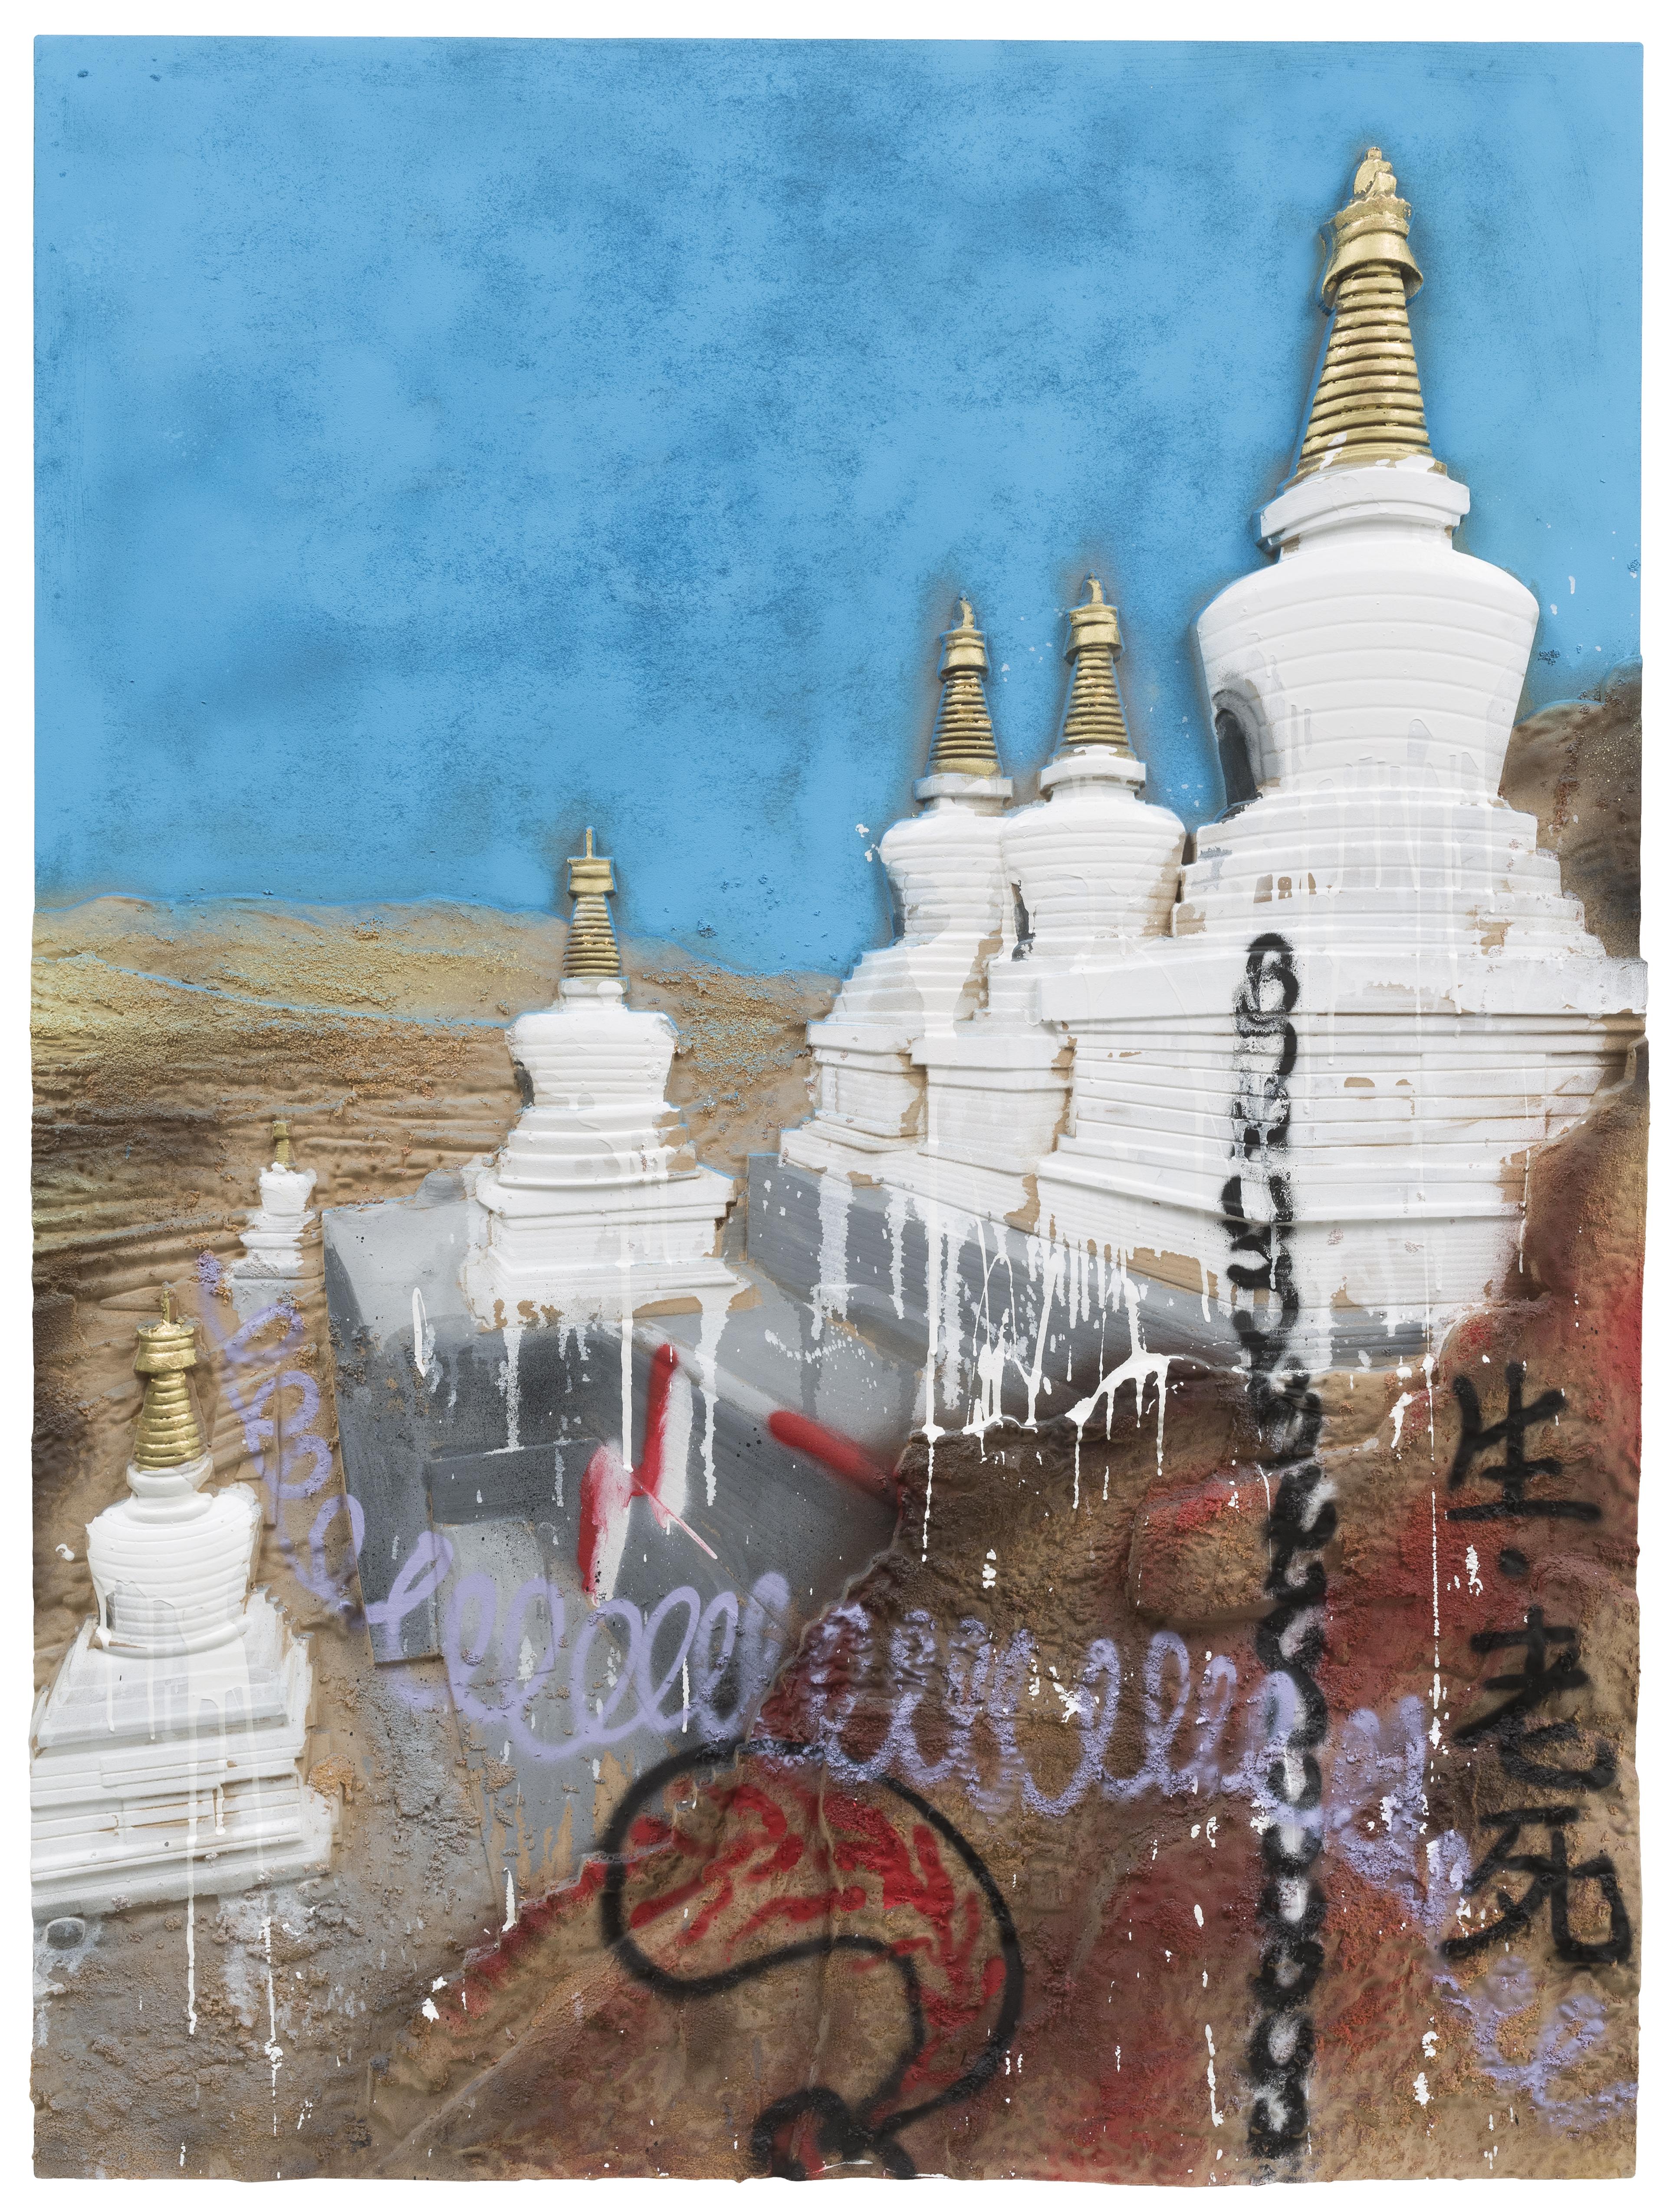 Recollection Pierces the Heart - Stupas